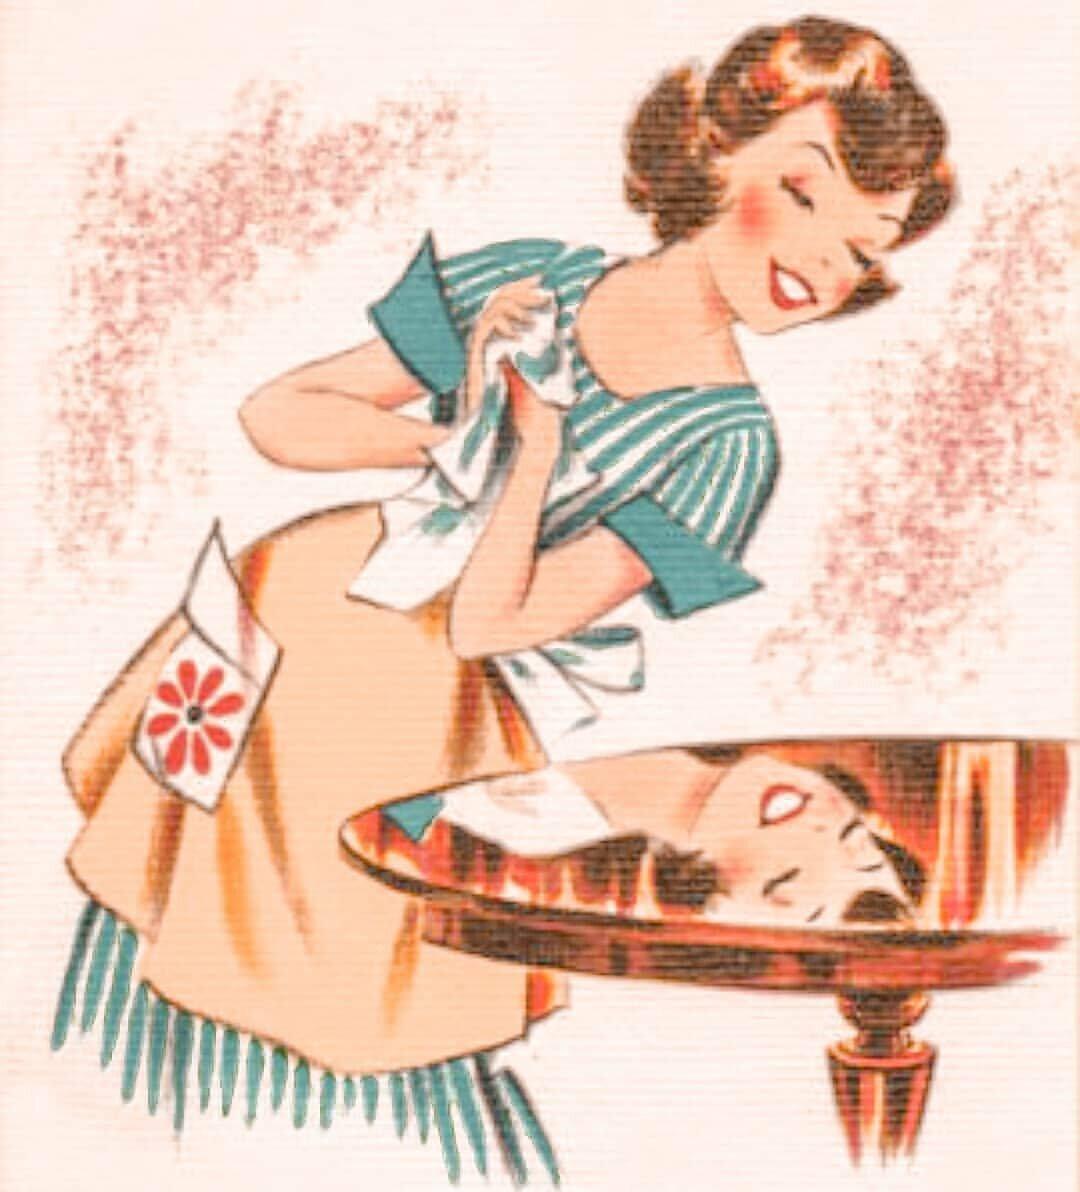 Маргарите картинки, веселые картинки об уборке